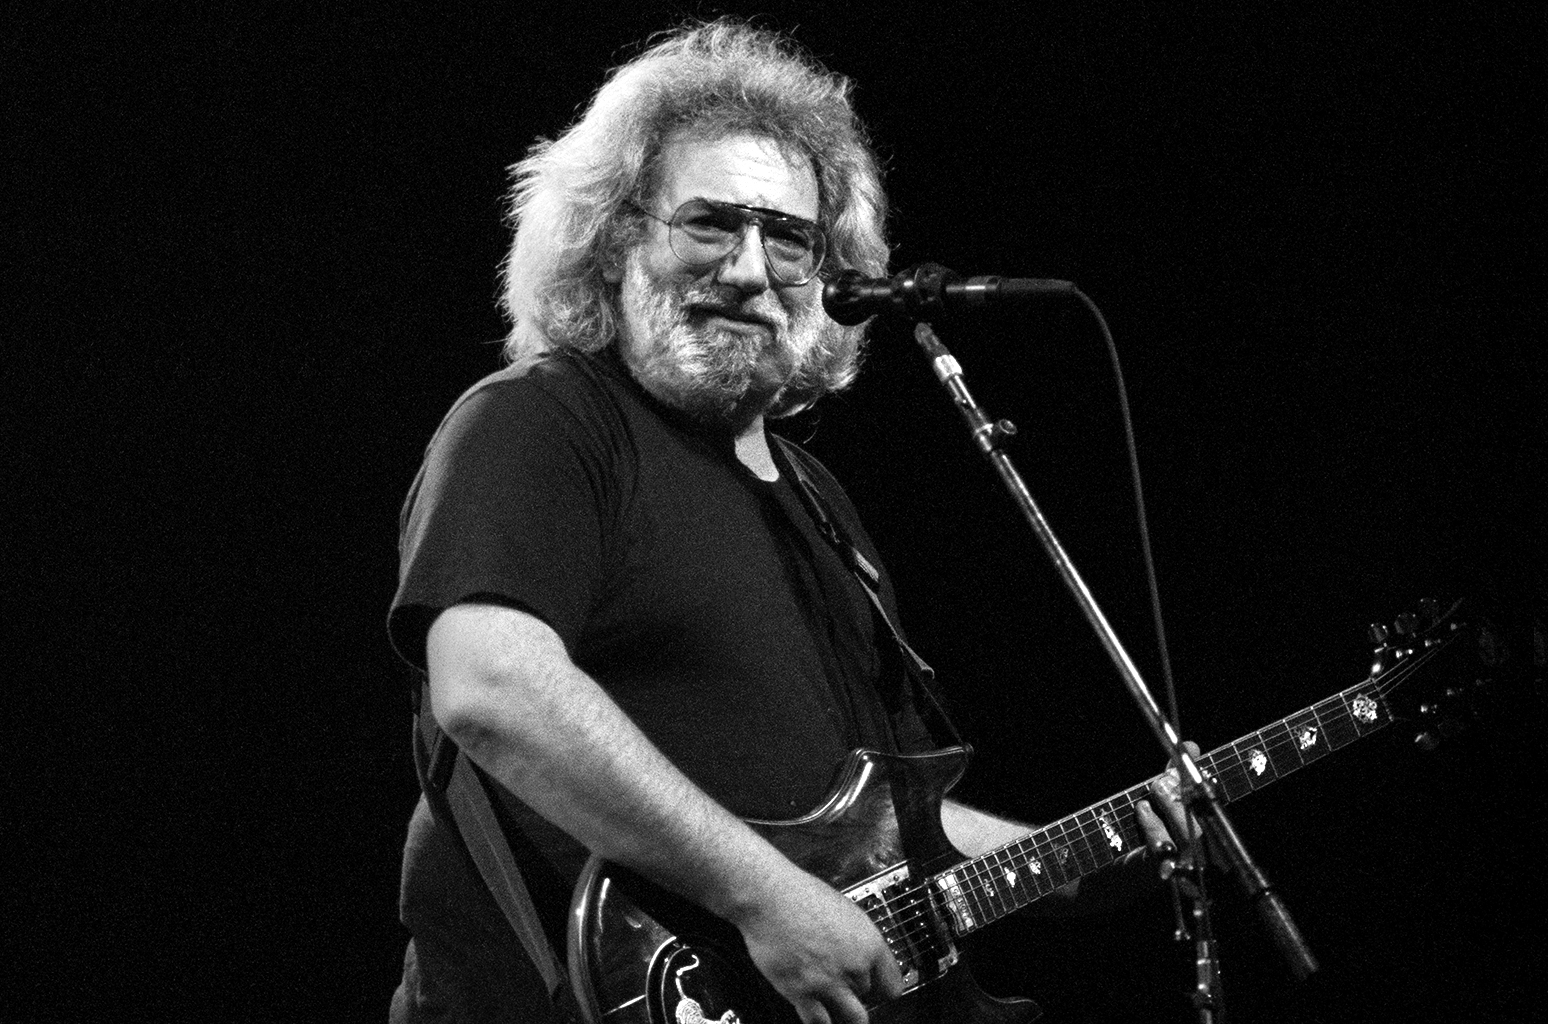 Jerry Garcia - Warfield Theater - San Francisco, California U.S.A. - January 31, 1991